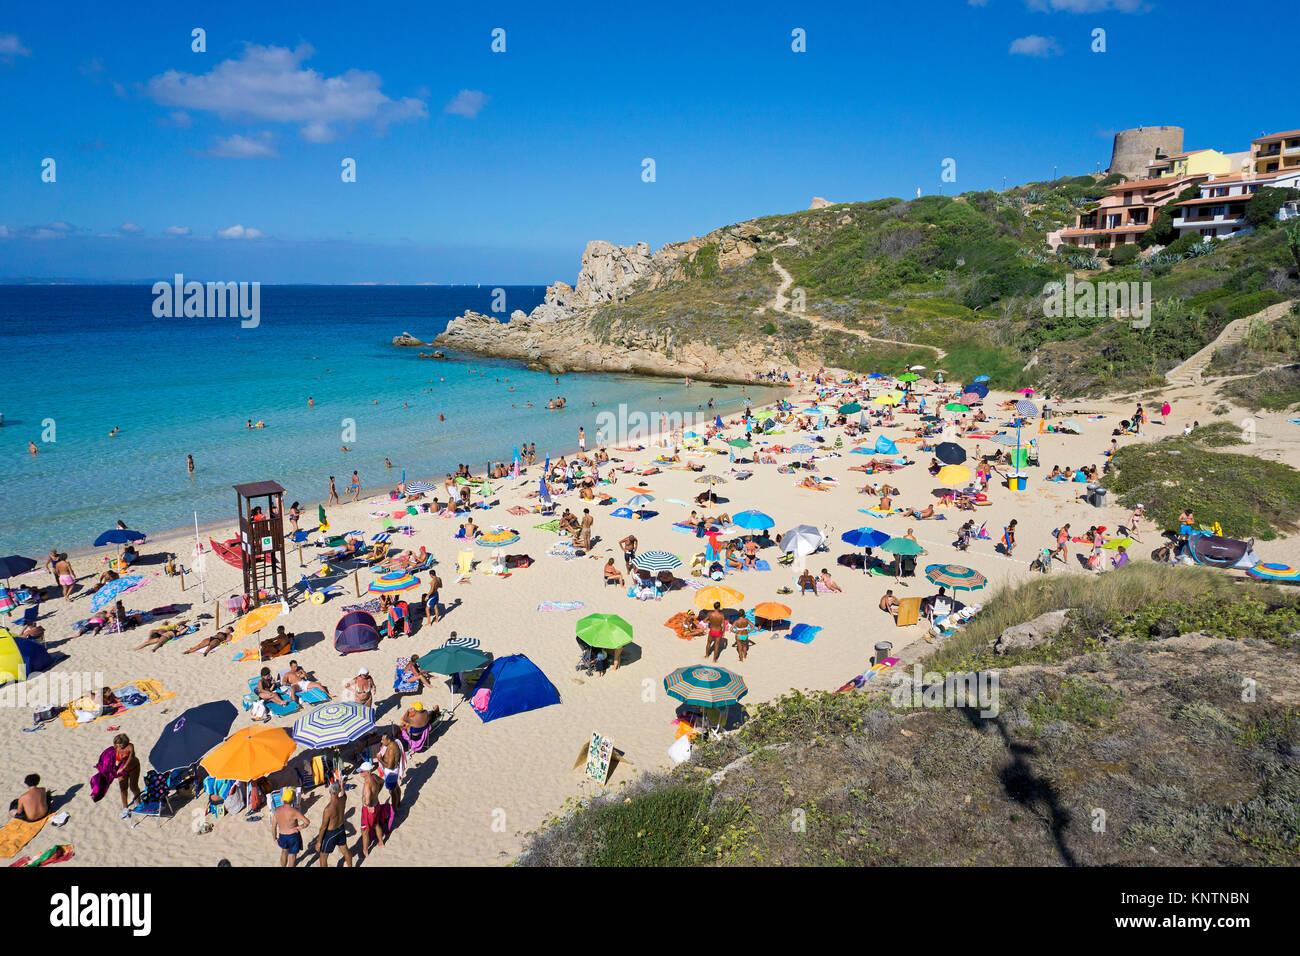 Beachlife à la plage Rena Bianca, Santa Teresa di Gallura, Sardaigne, Italie, Méditerranée, Europe Banque D'Images